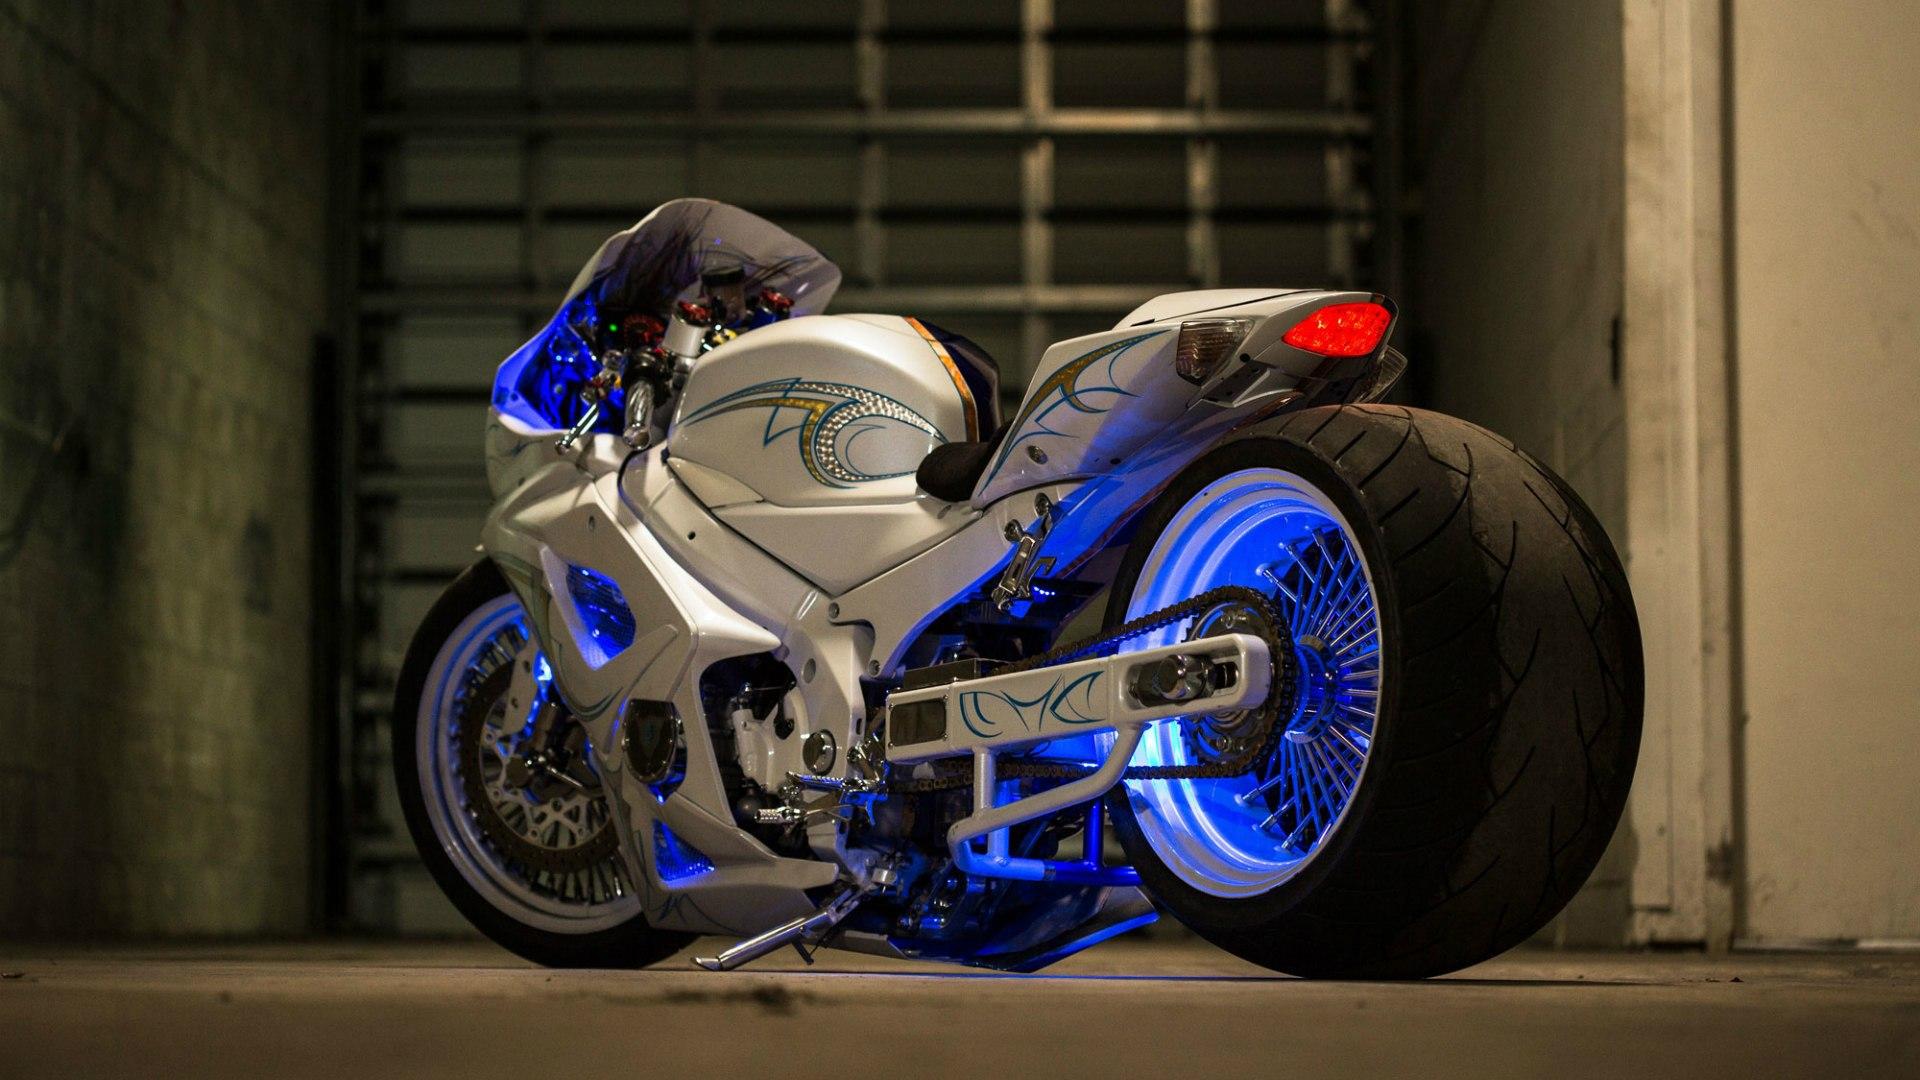 suzuki motocross bike hd - photo #39